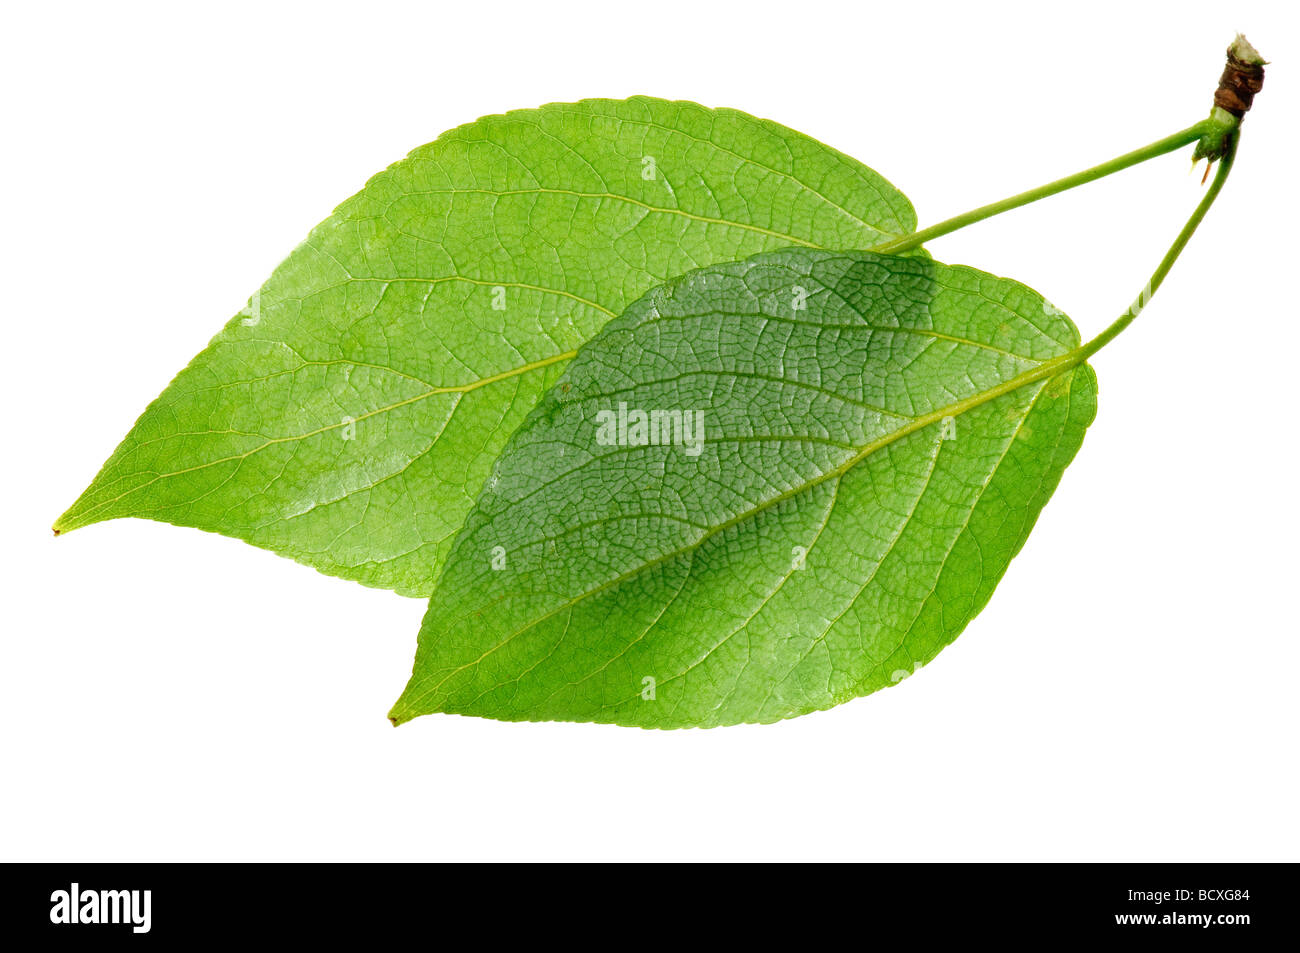 Foglie verdi isolati su bianco Immagini Stock